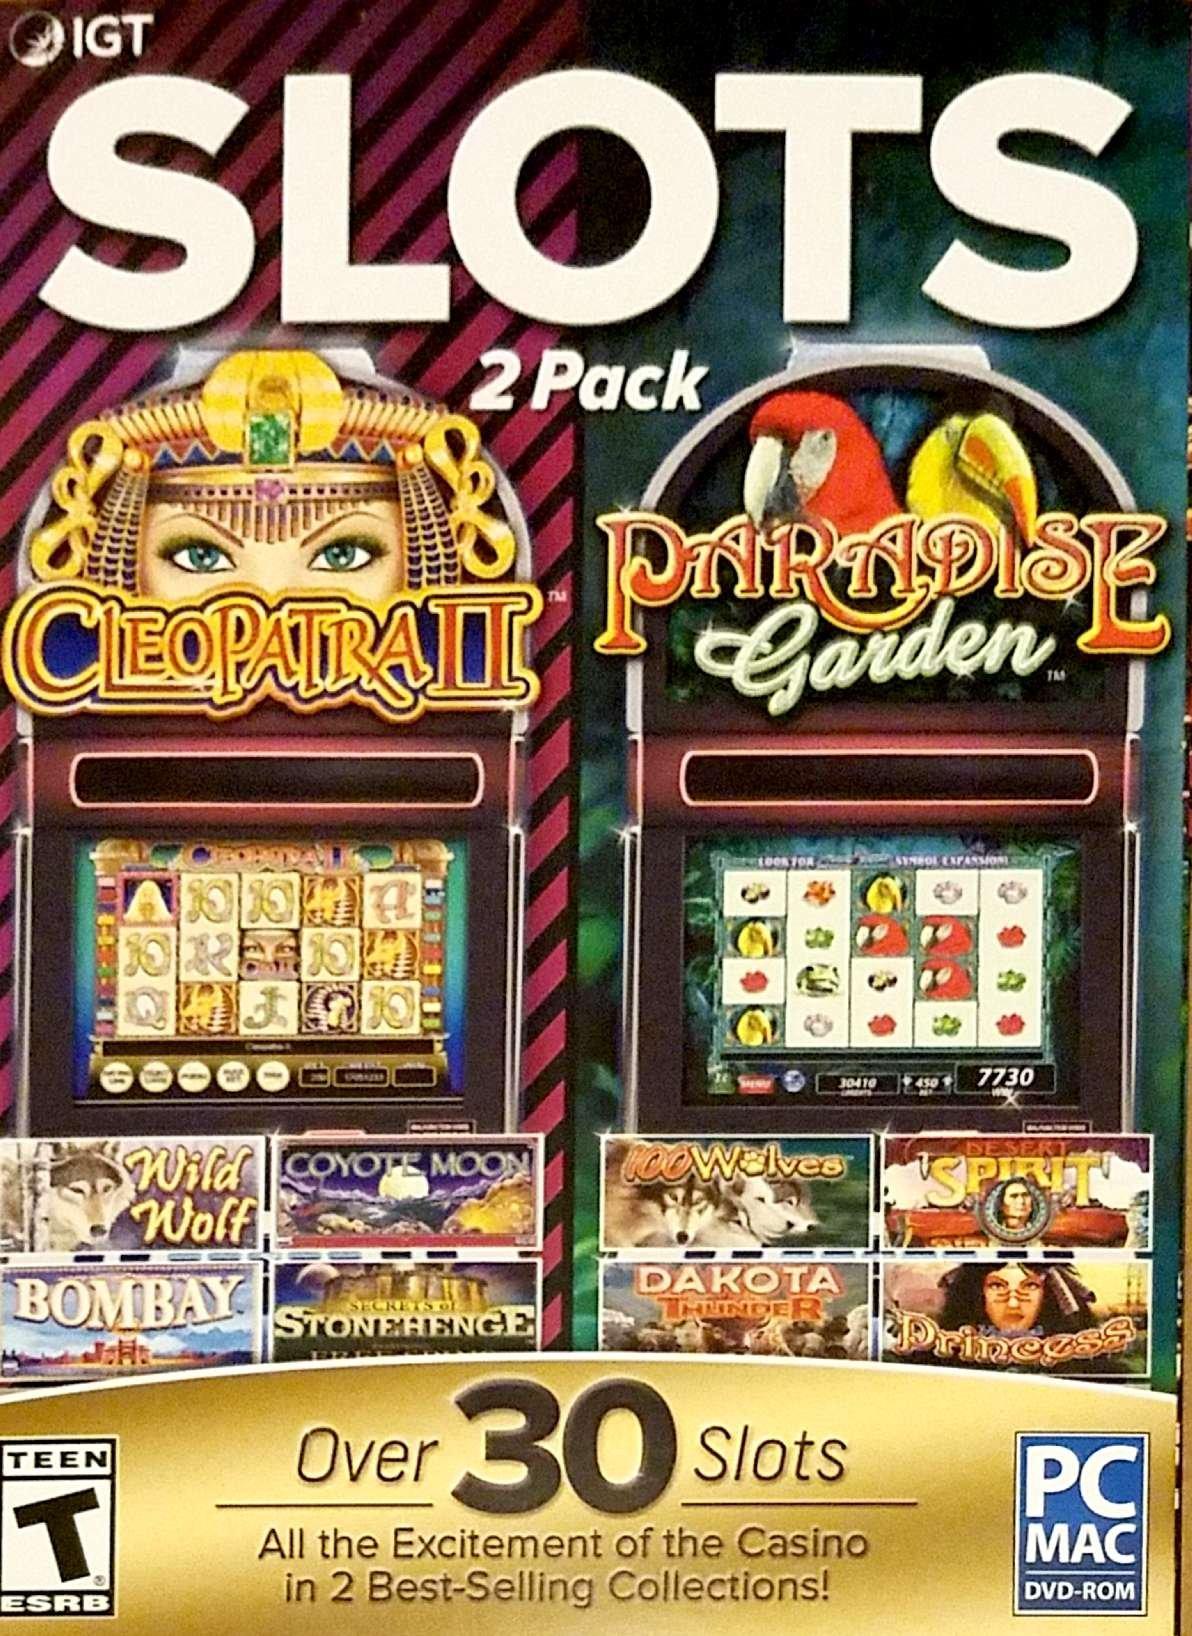 Igt Slots 2 Pack Cleopatra Ii Paradise Garden Buy Online In Isle Of Man At Isleofman Desertcart Com Productid 57520805